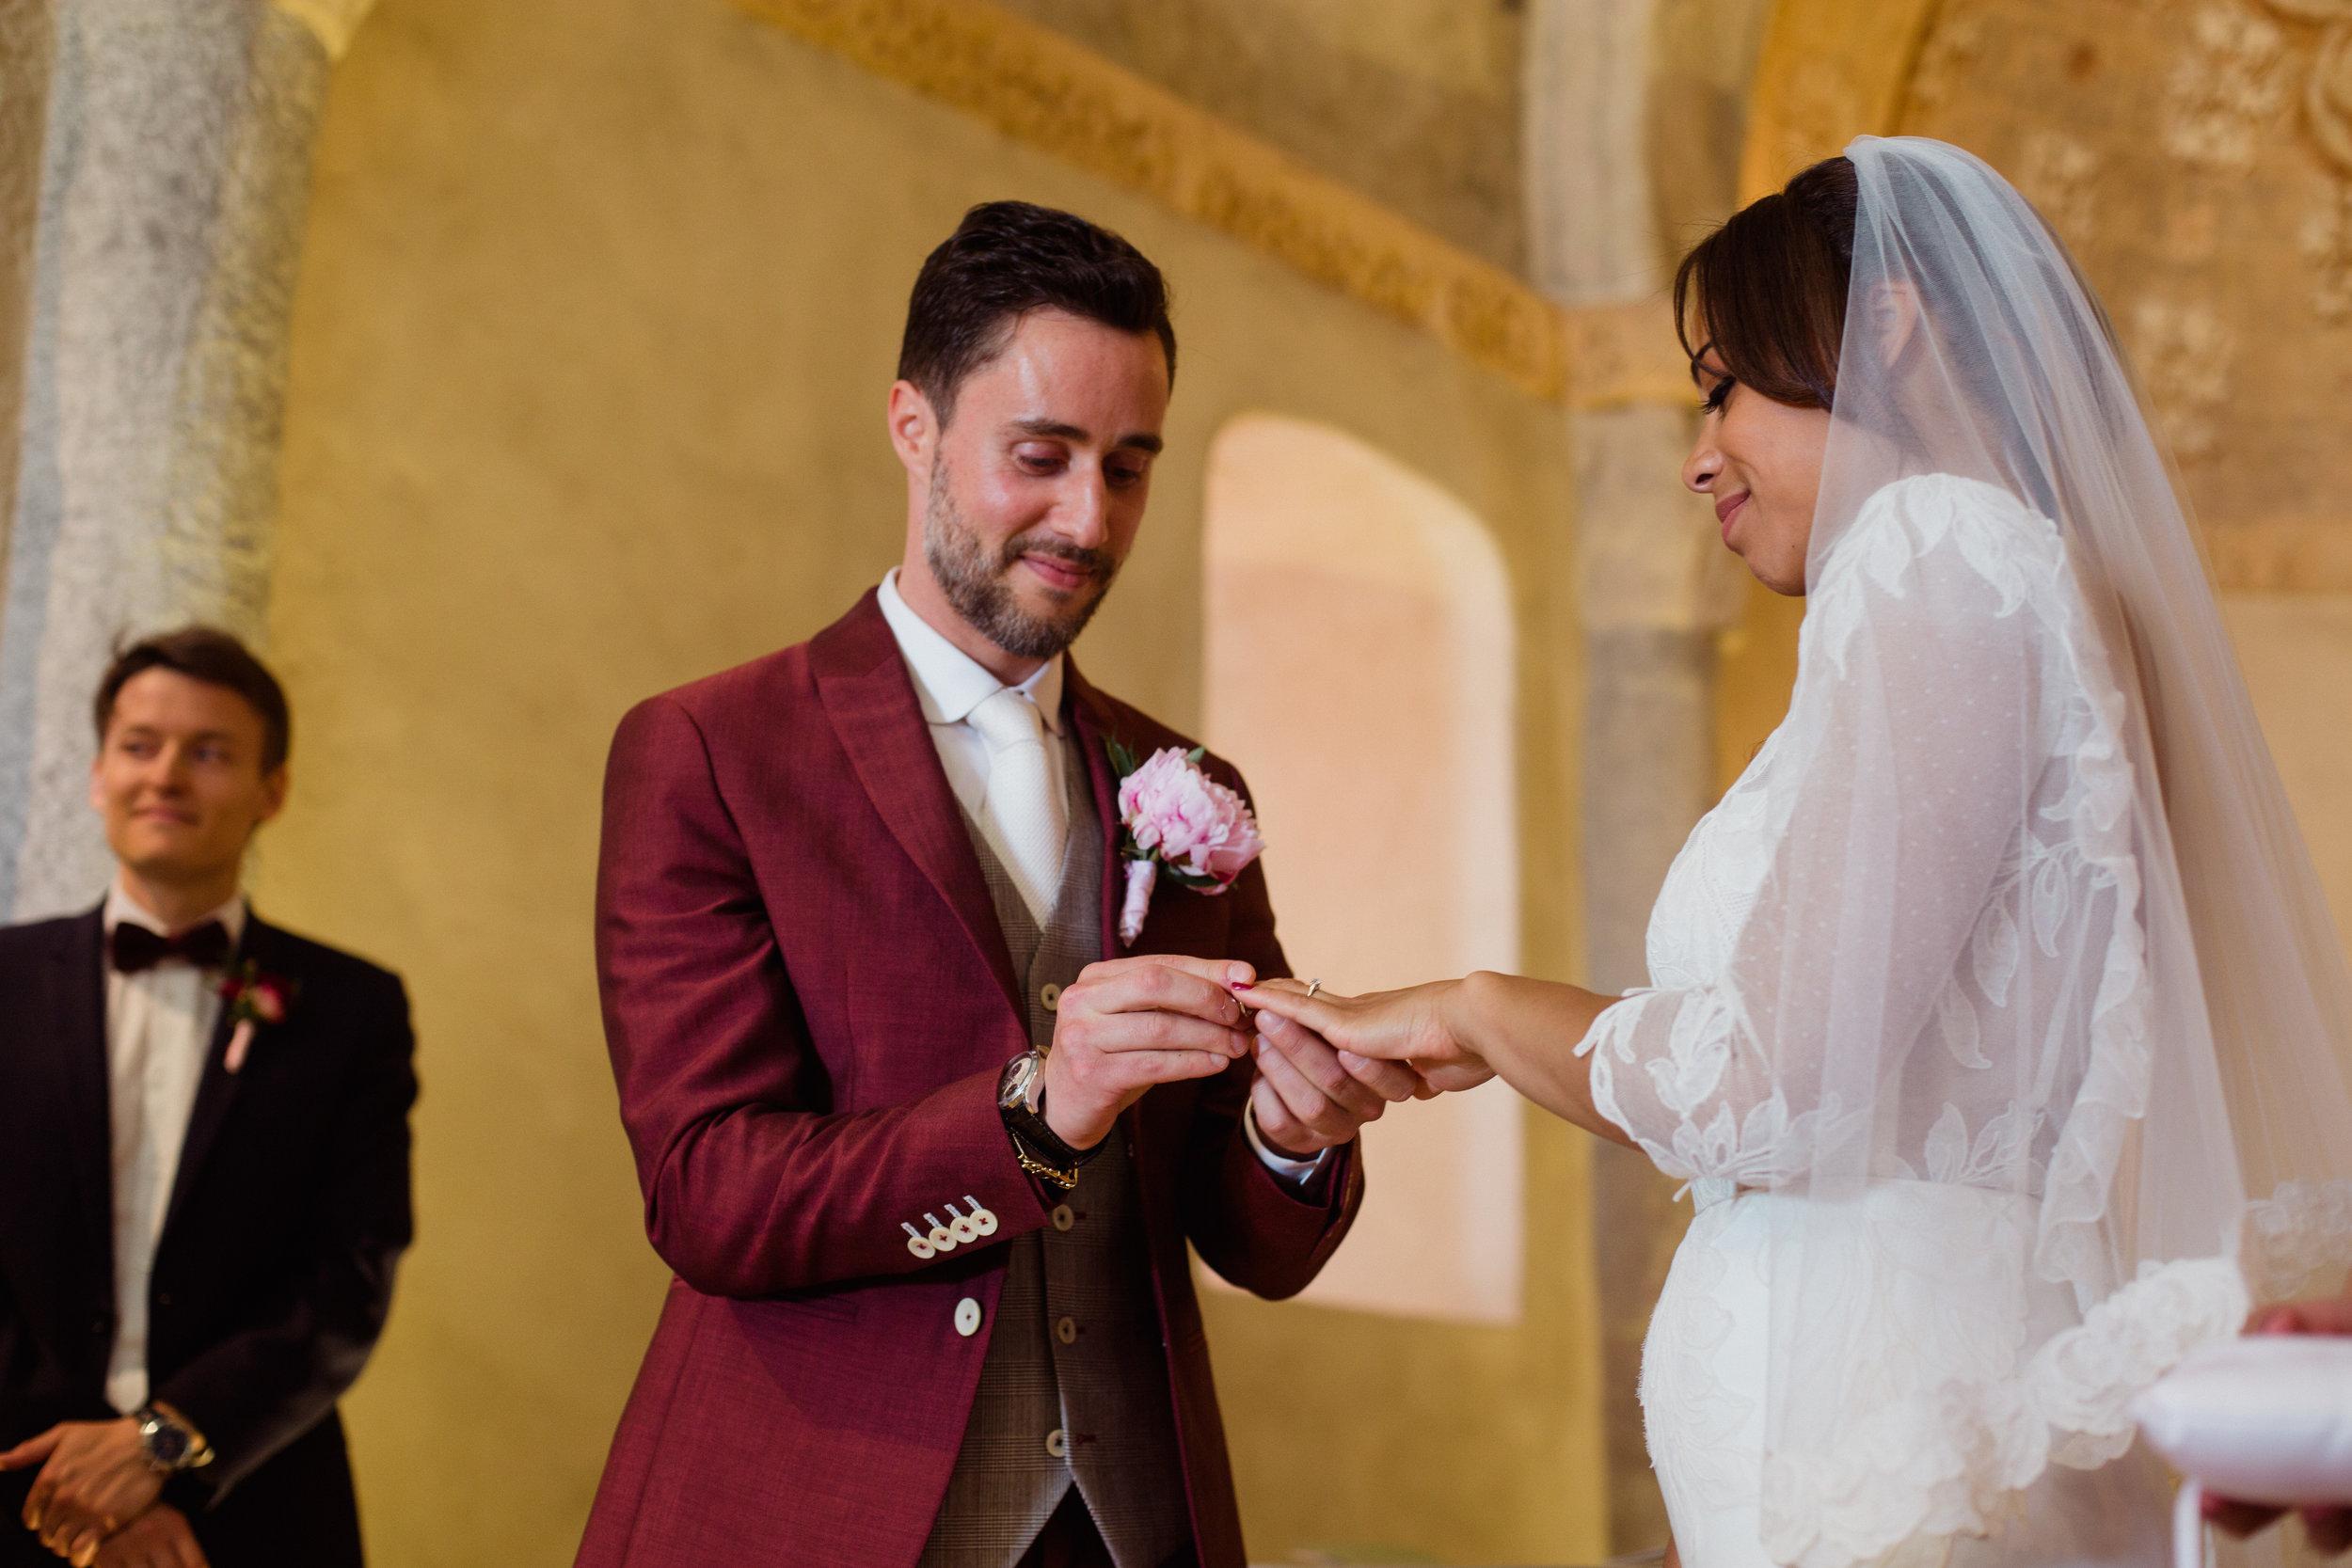 mariage_tropical_bassin_arcachon_villa_latosca_photographe_sudouest_pauline_maroussia